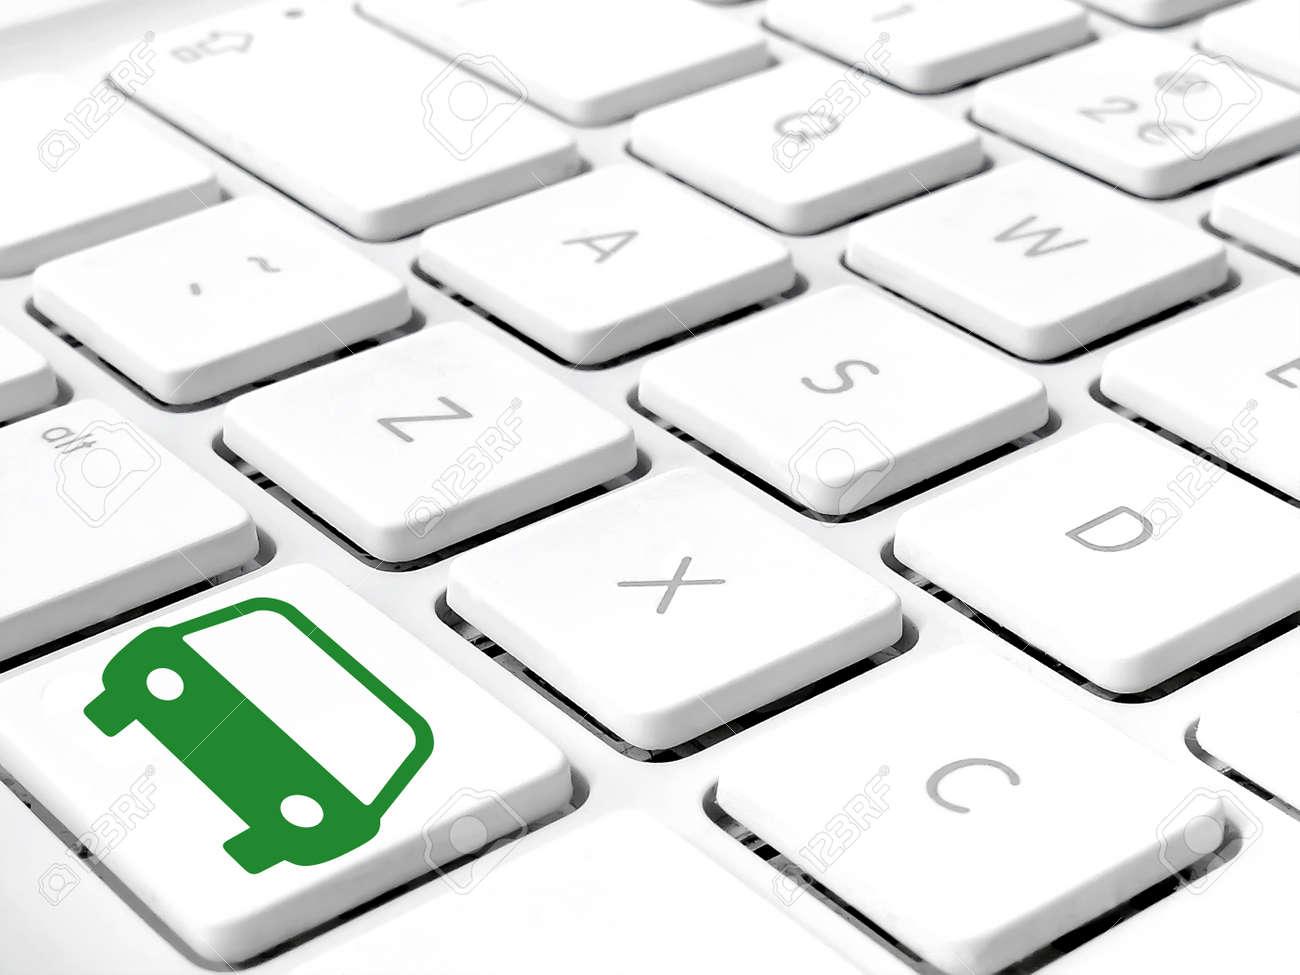 Keyboard White Keys Close Up With Green Car Symbol On Lower Key